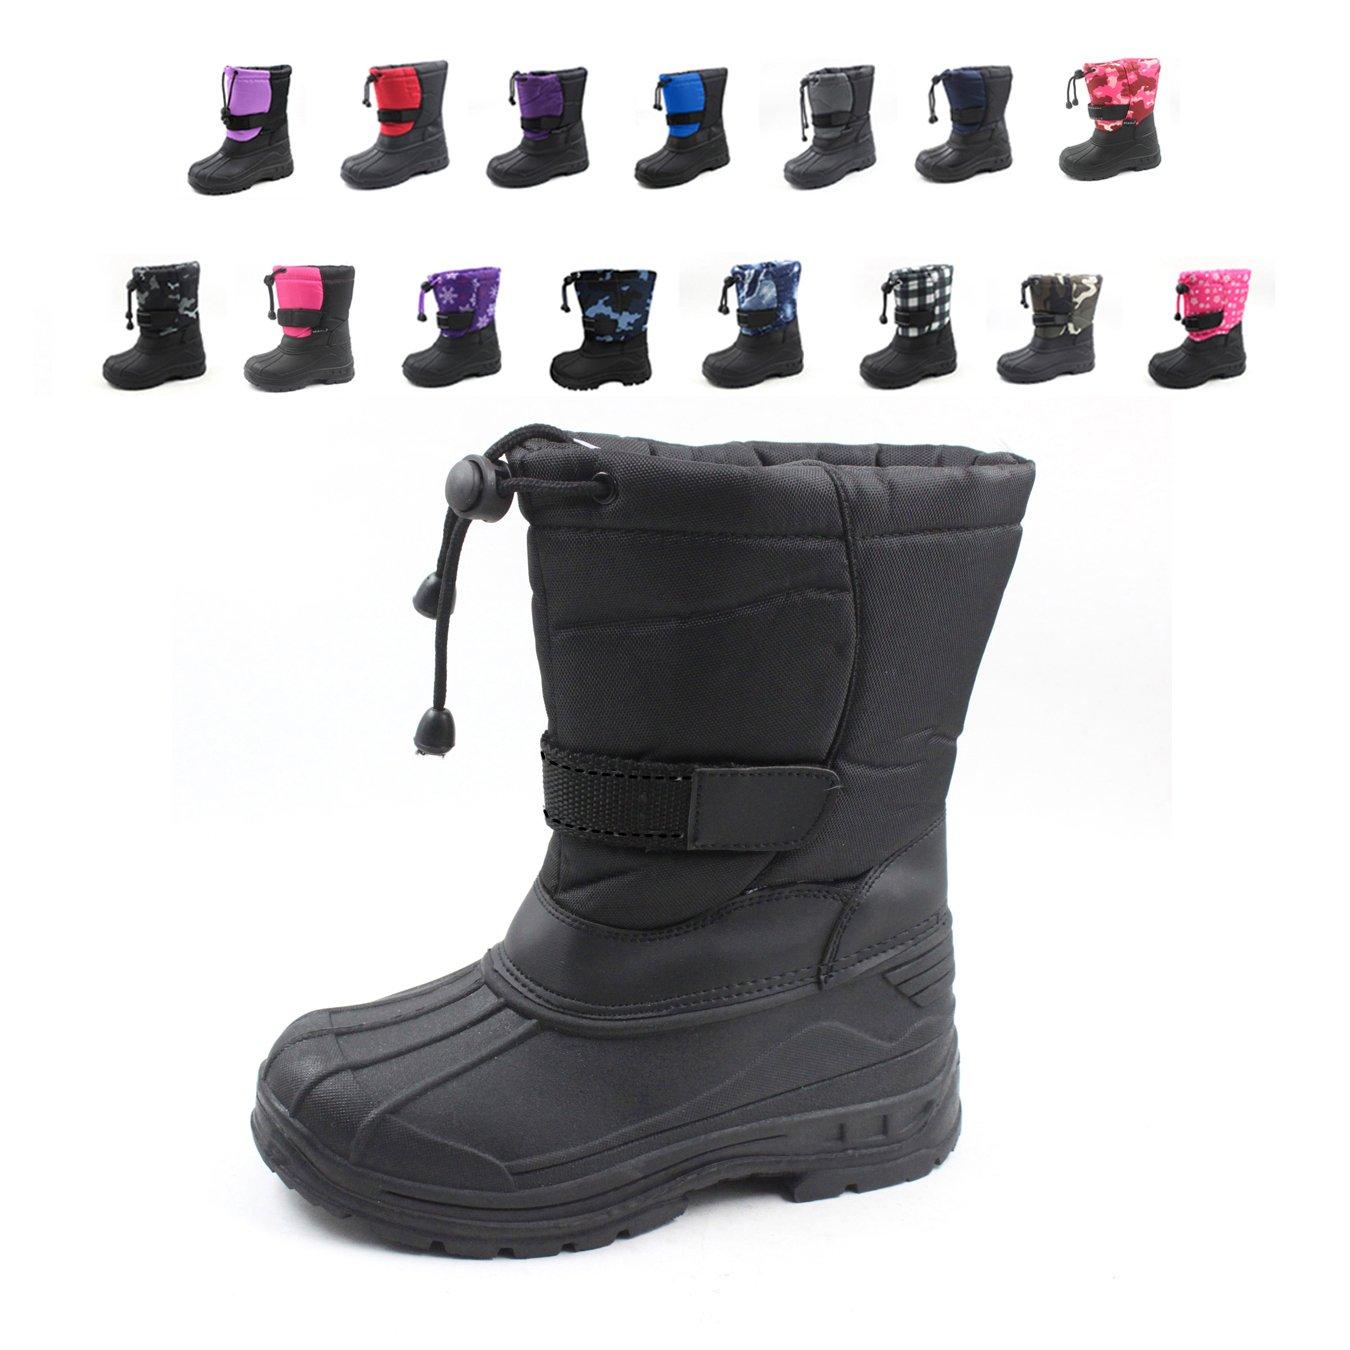 Skadoo Boys ''Snow Goer'' Boots - black, 3 youth